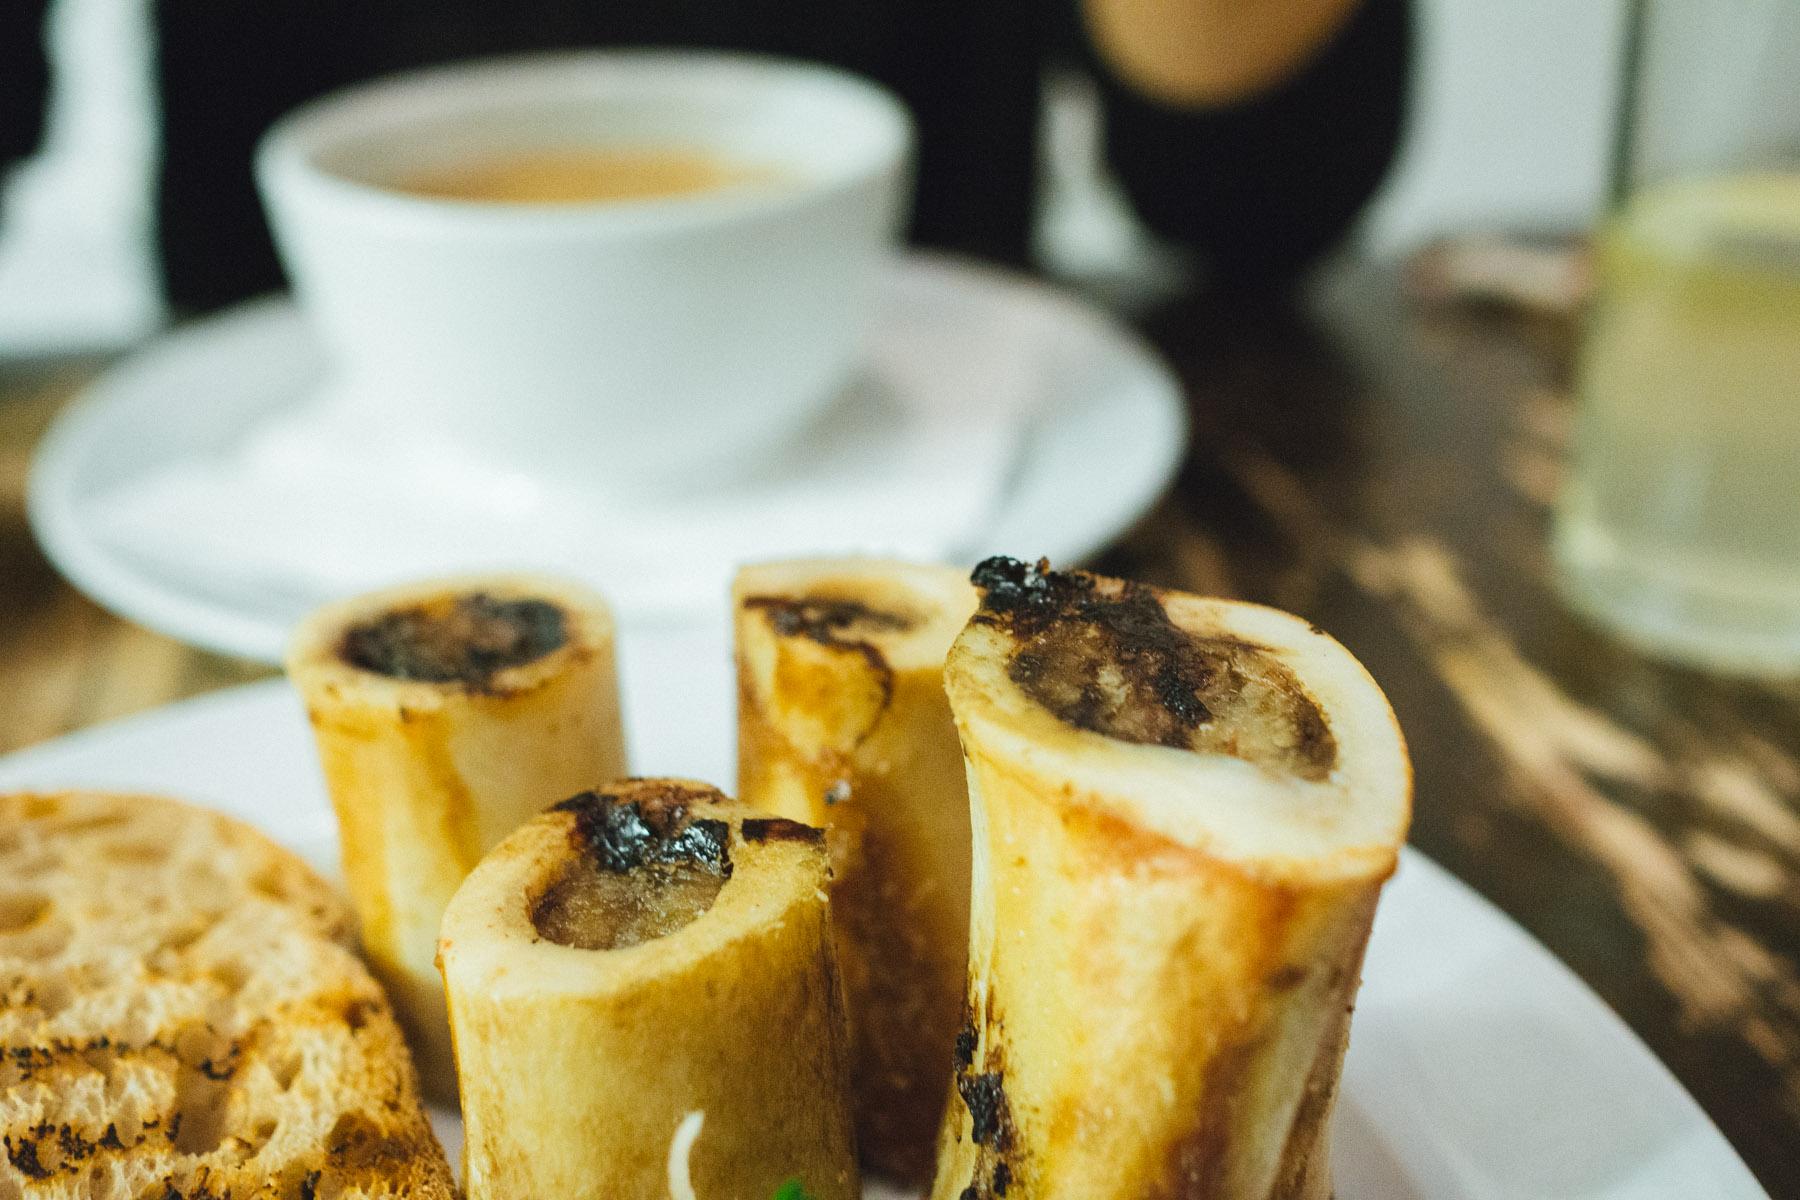 7-best-restaurants-2014-saint-john-bar-restaurant-smithfield-london-england-bone-marrow-1